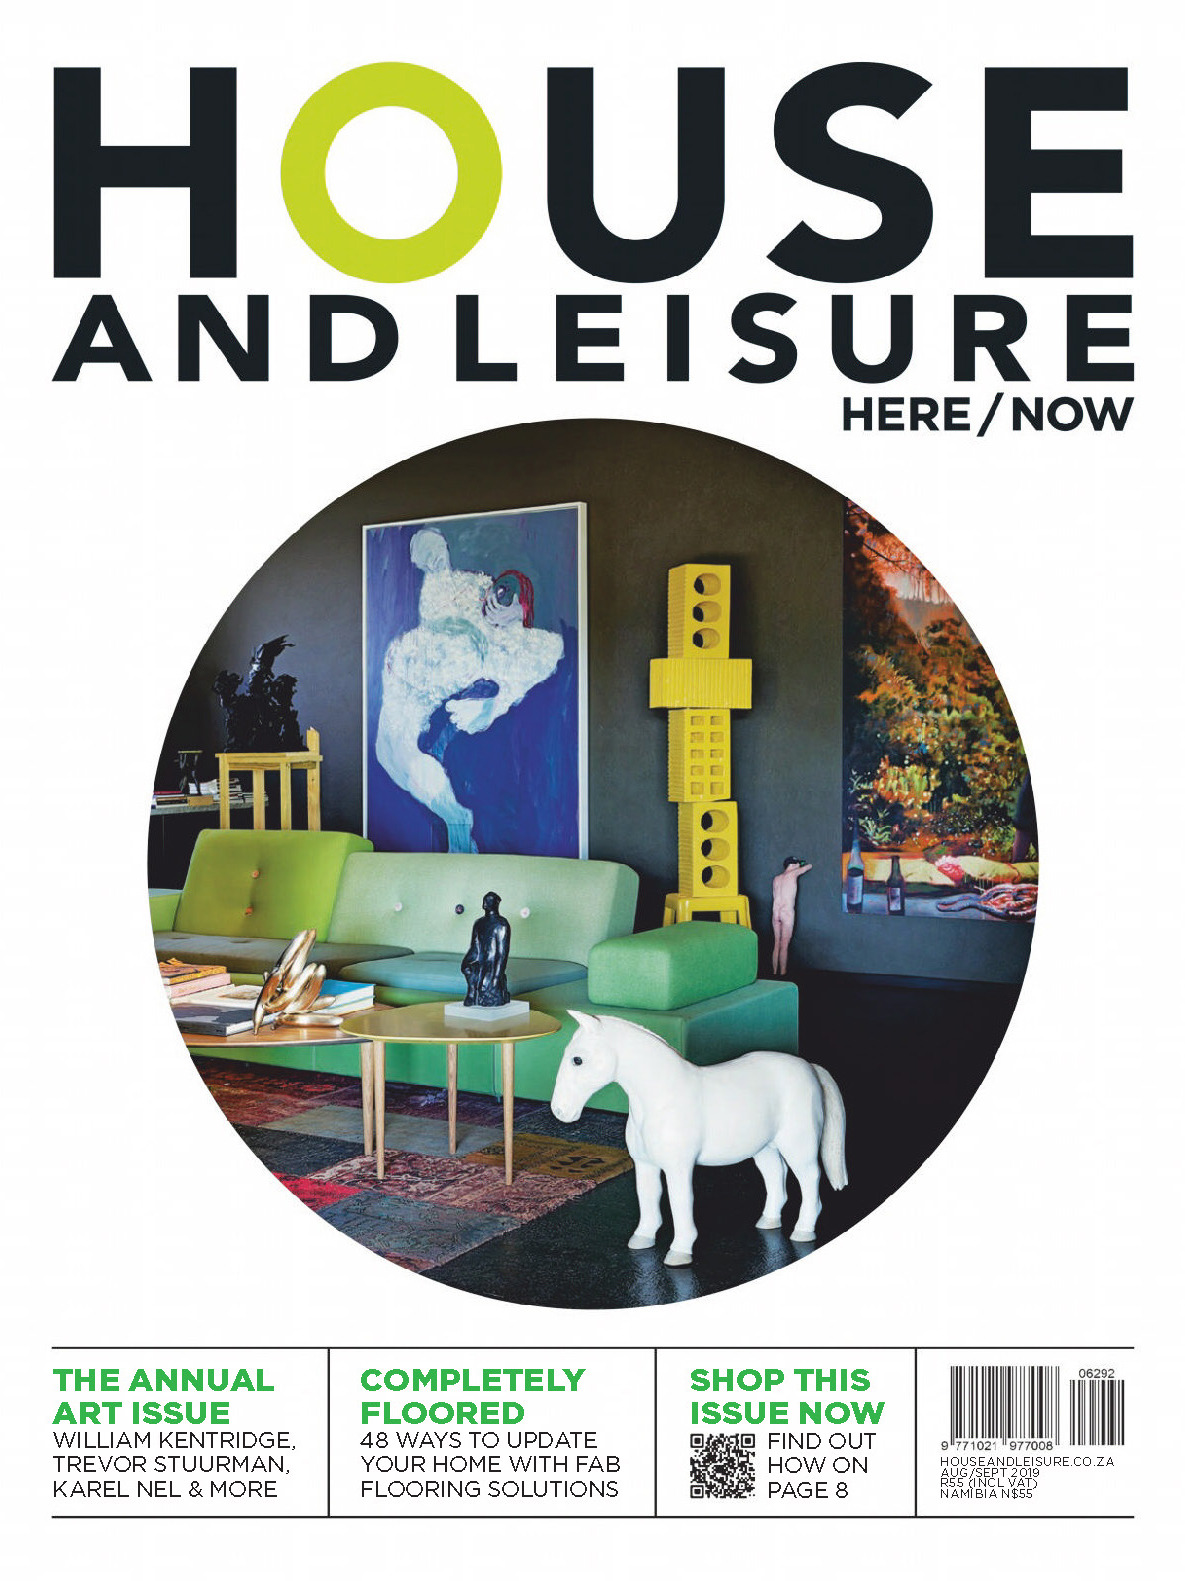 《House and Leisure》南非版时尚家居设计杂志2019年08-09月号